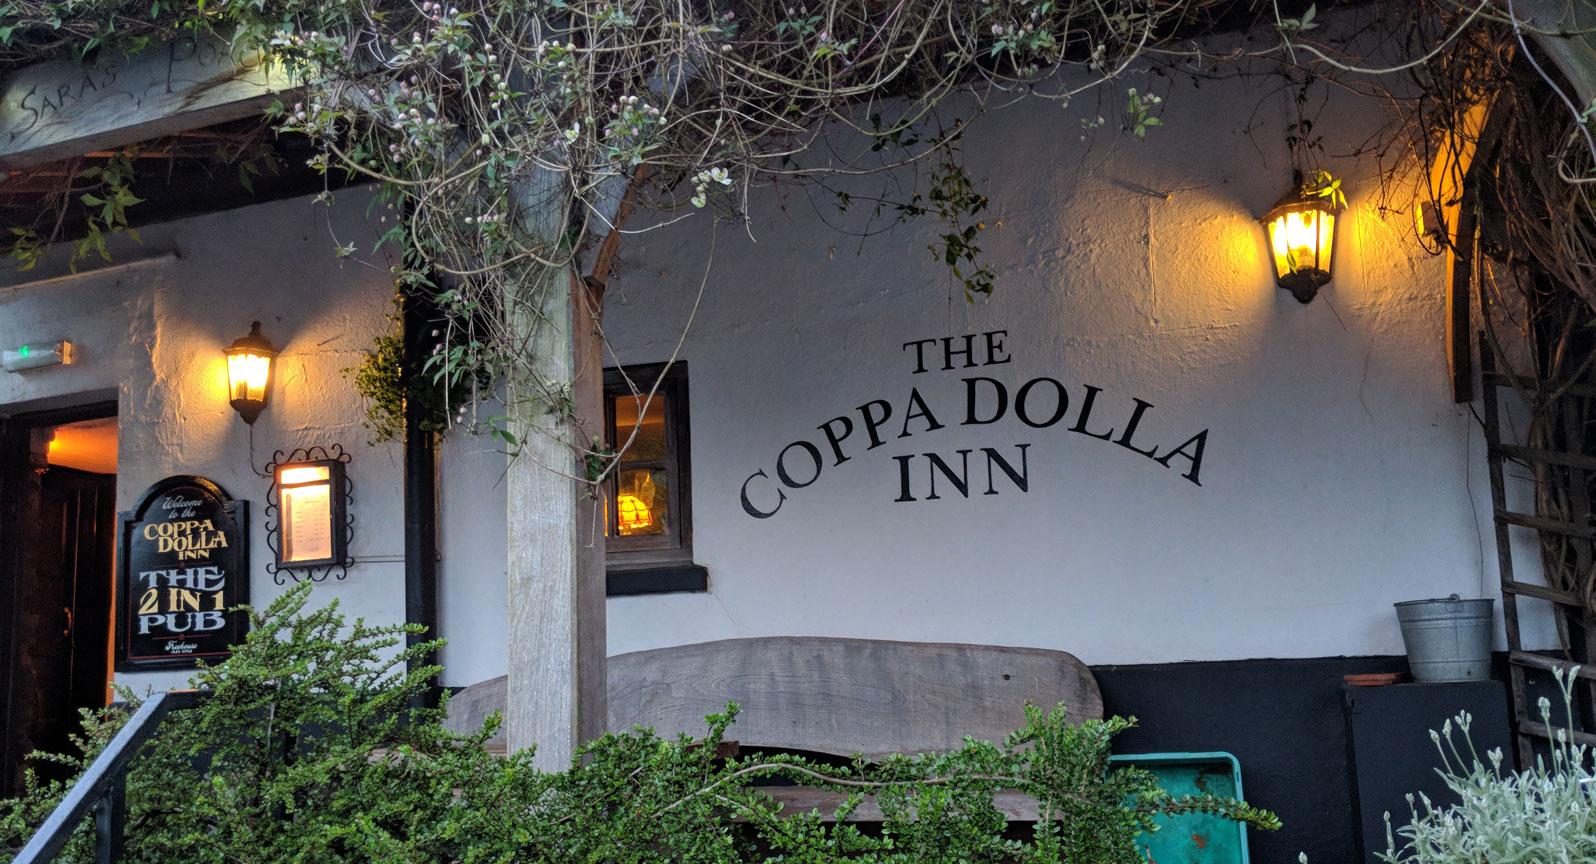 The Coppa Dolla Inn, Devon